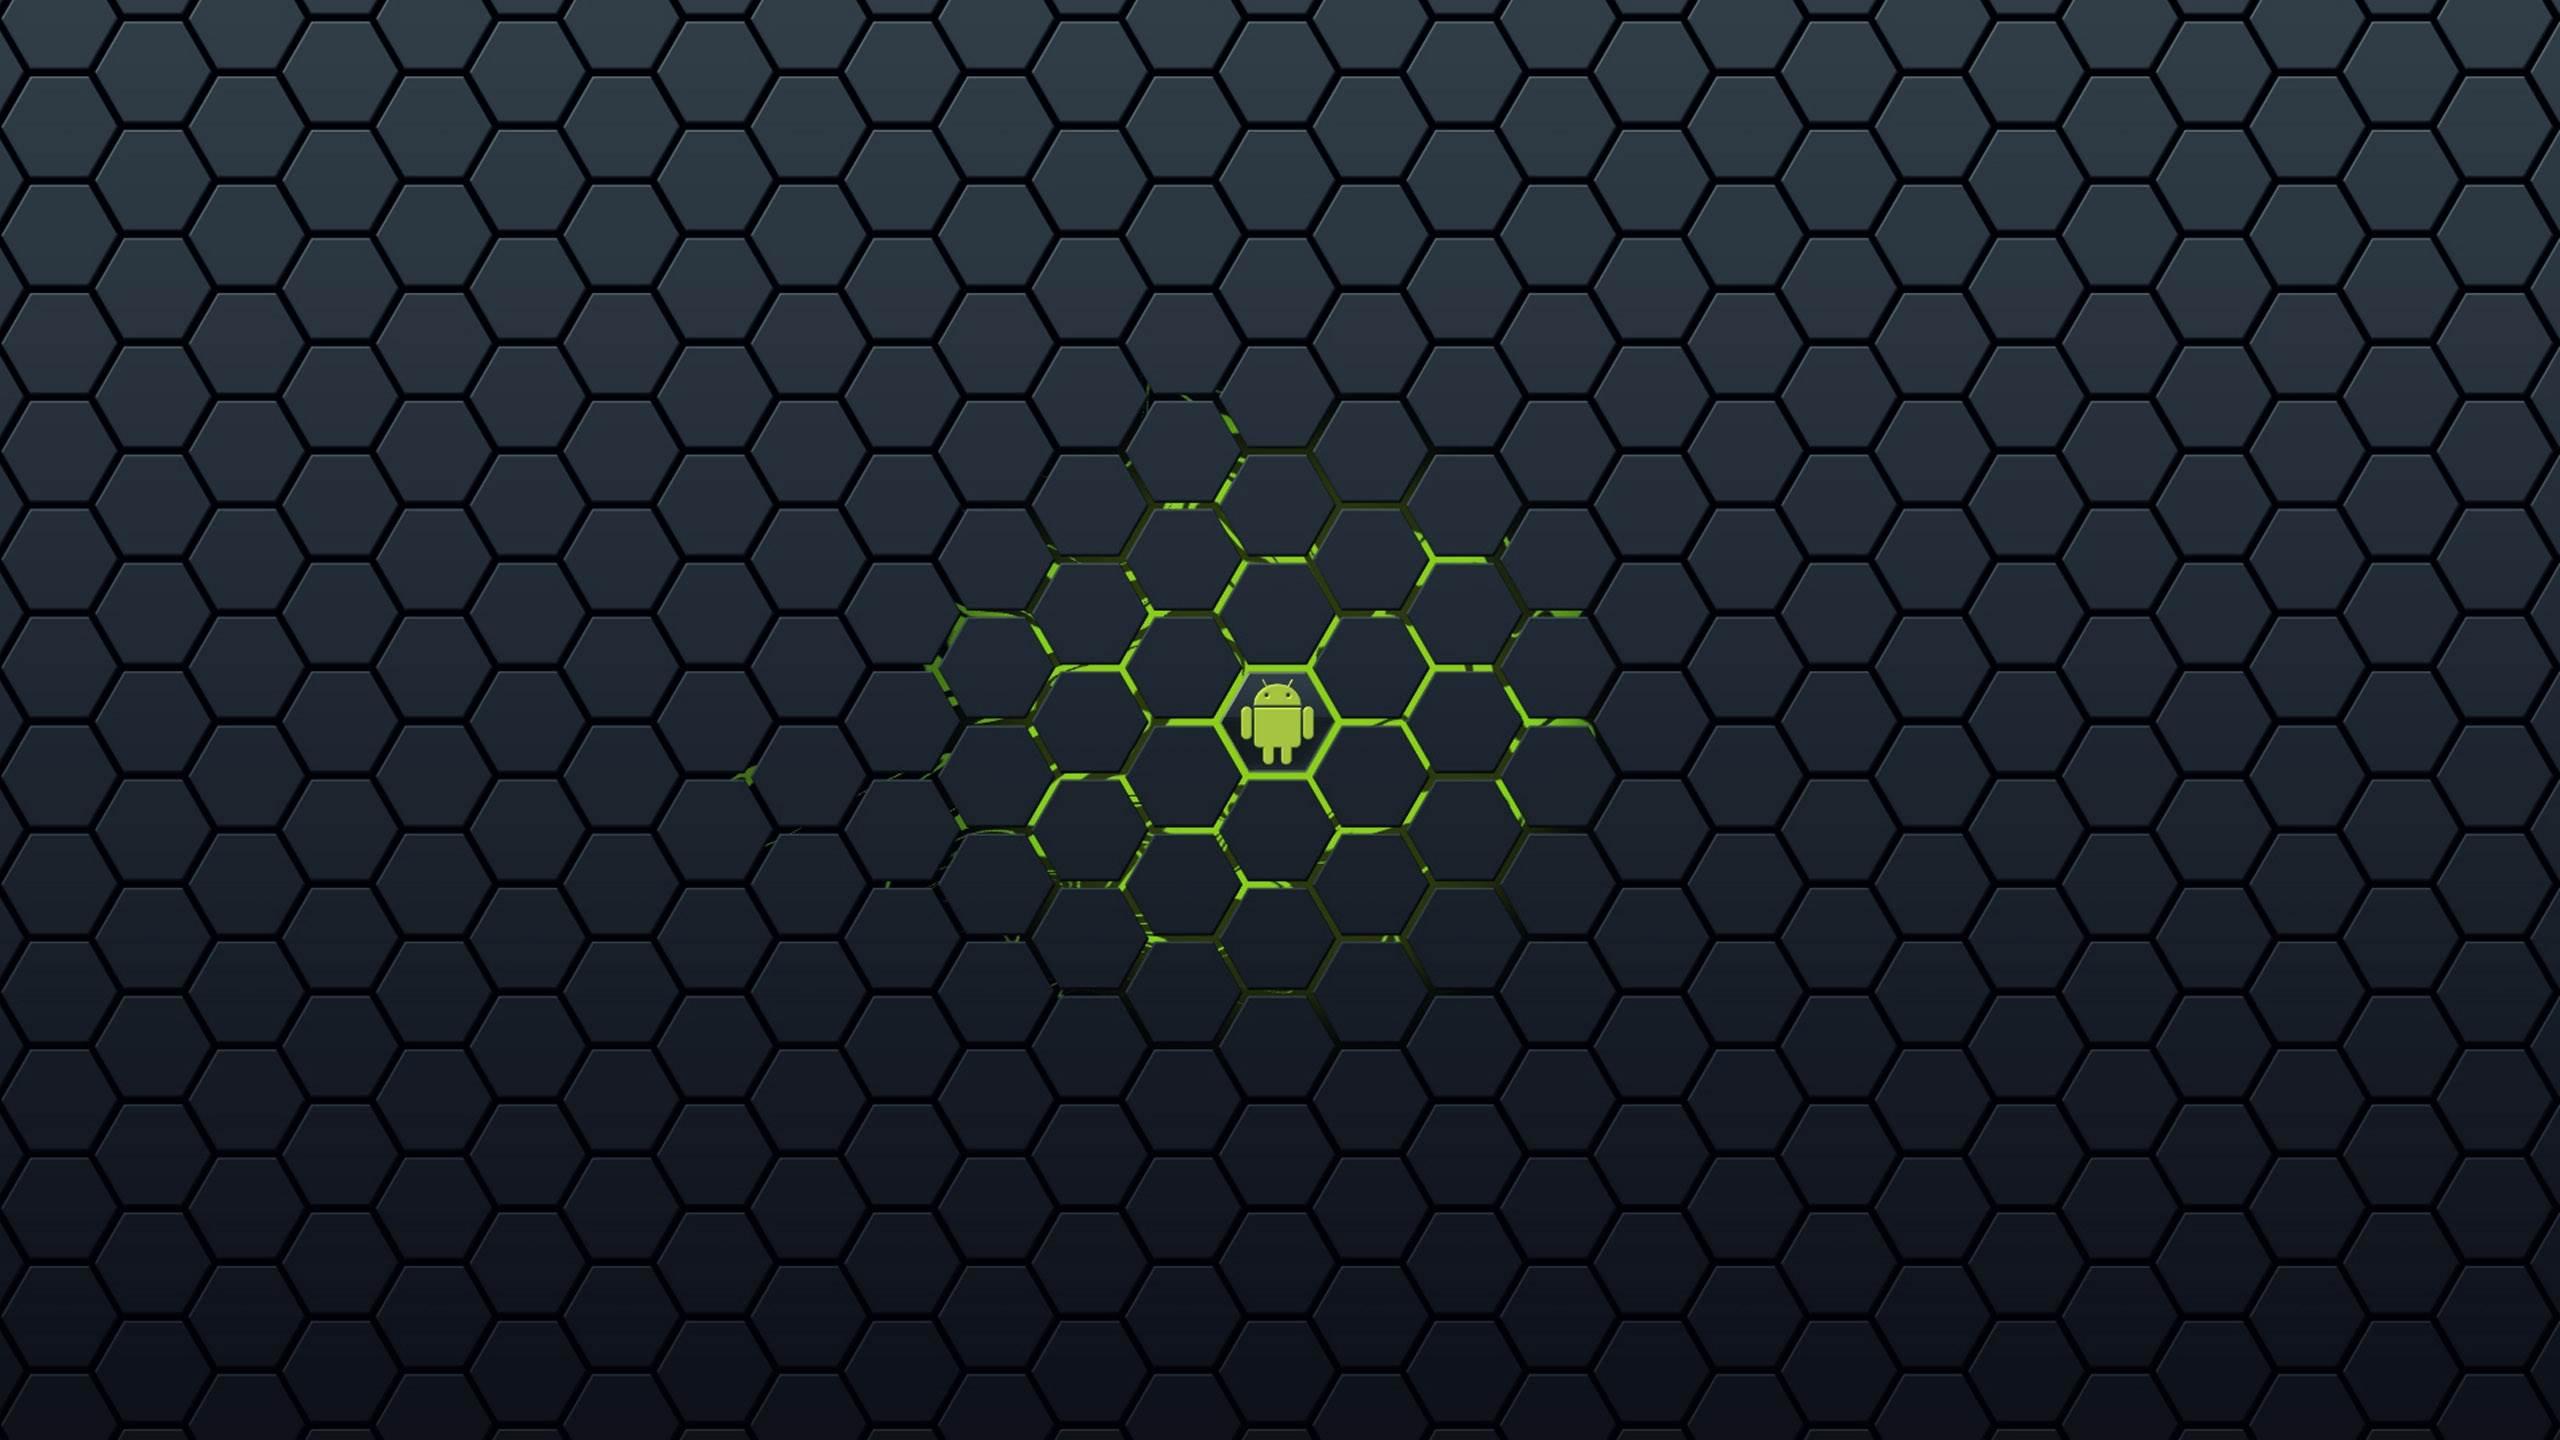 Full Hd Android Wallpapers Desktop Pics Creative Wallpaper